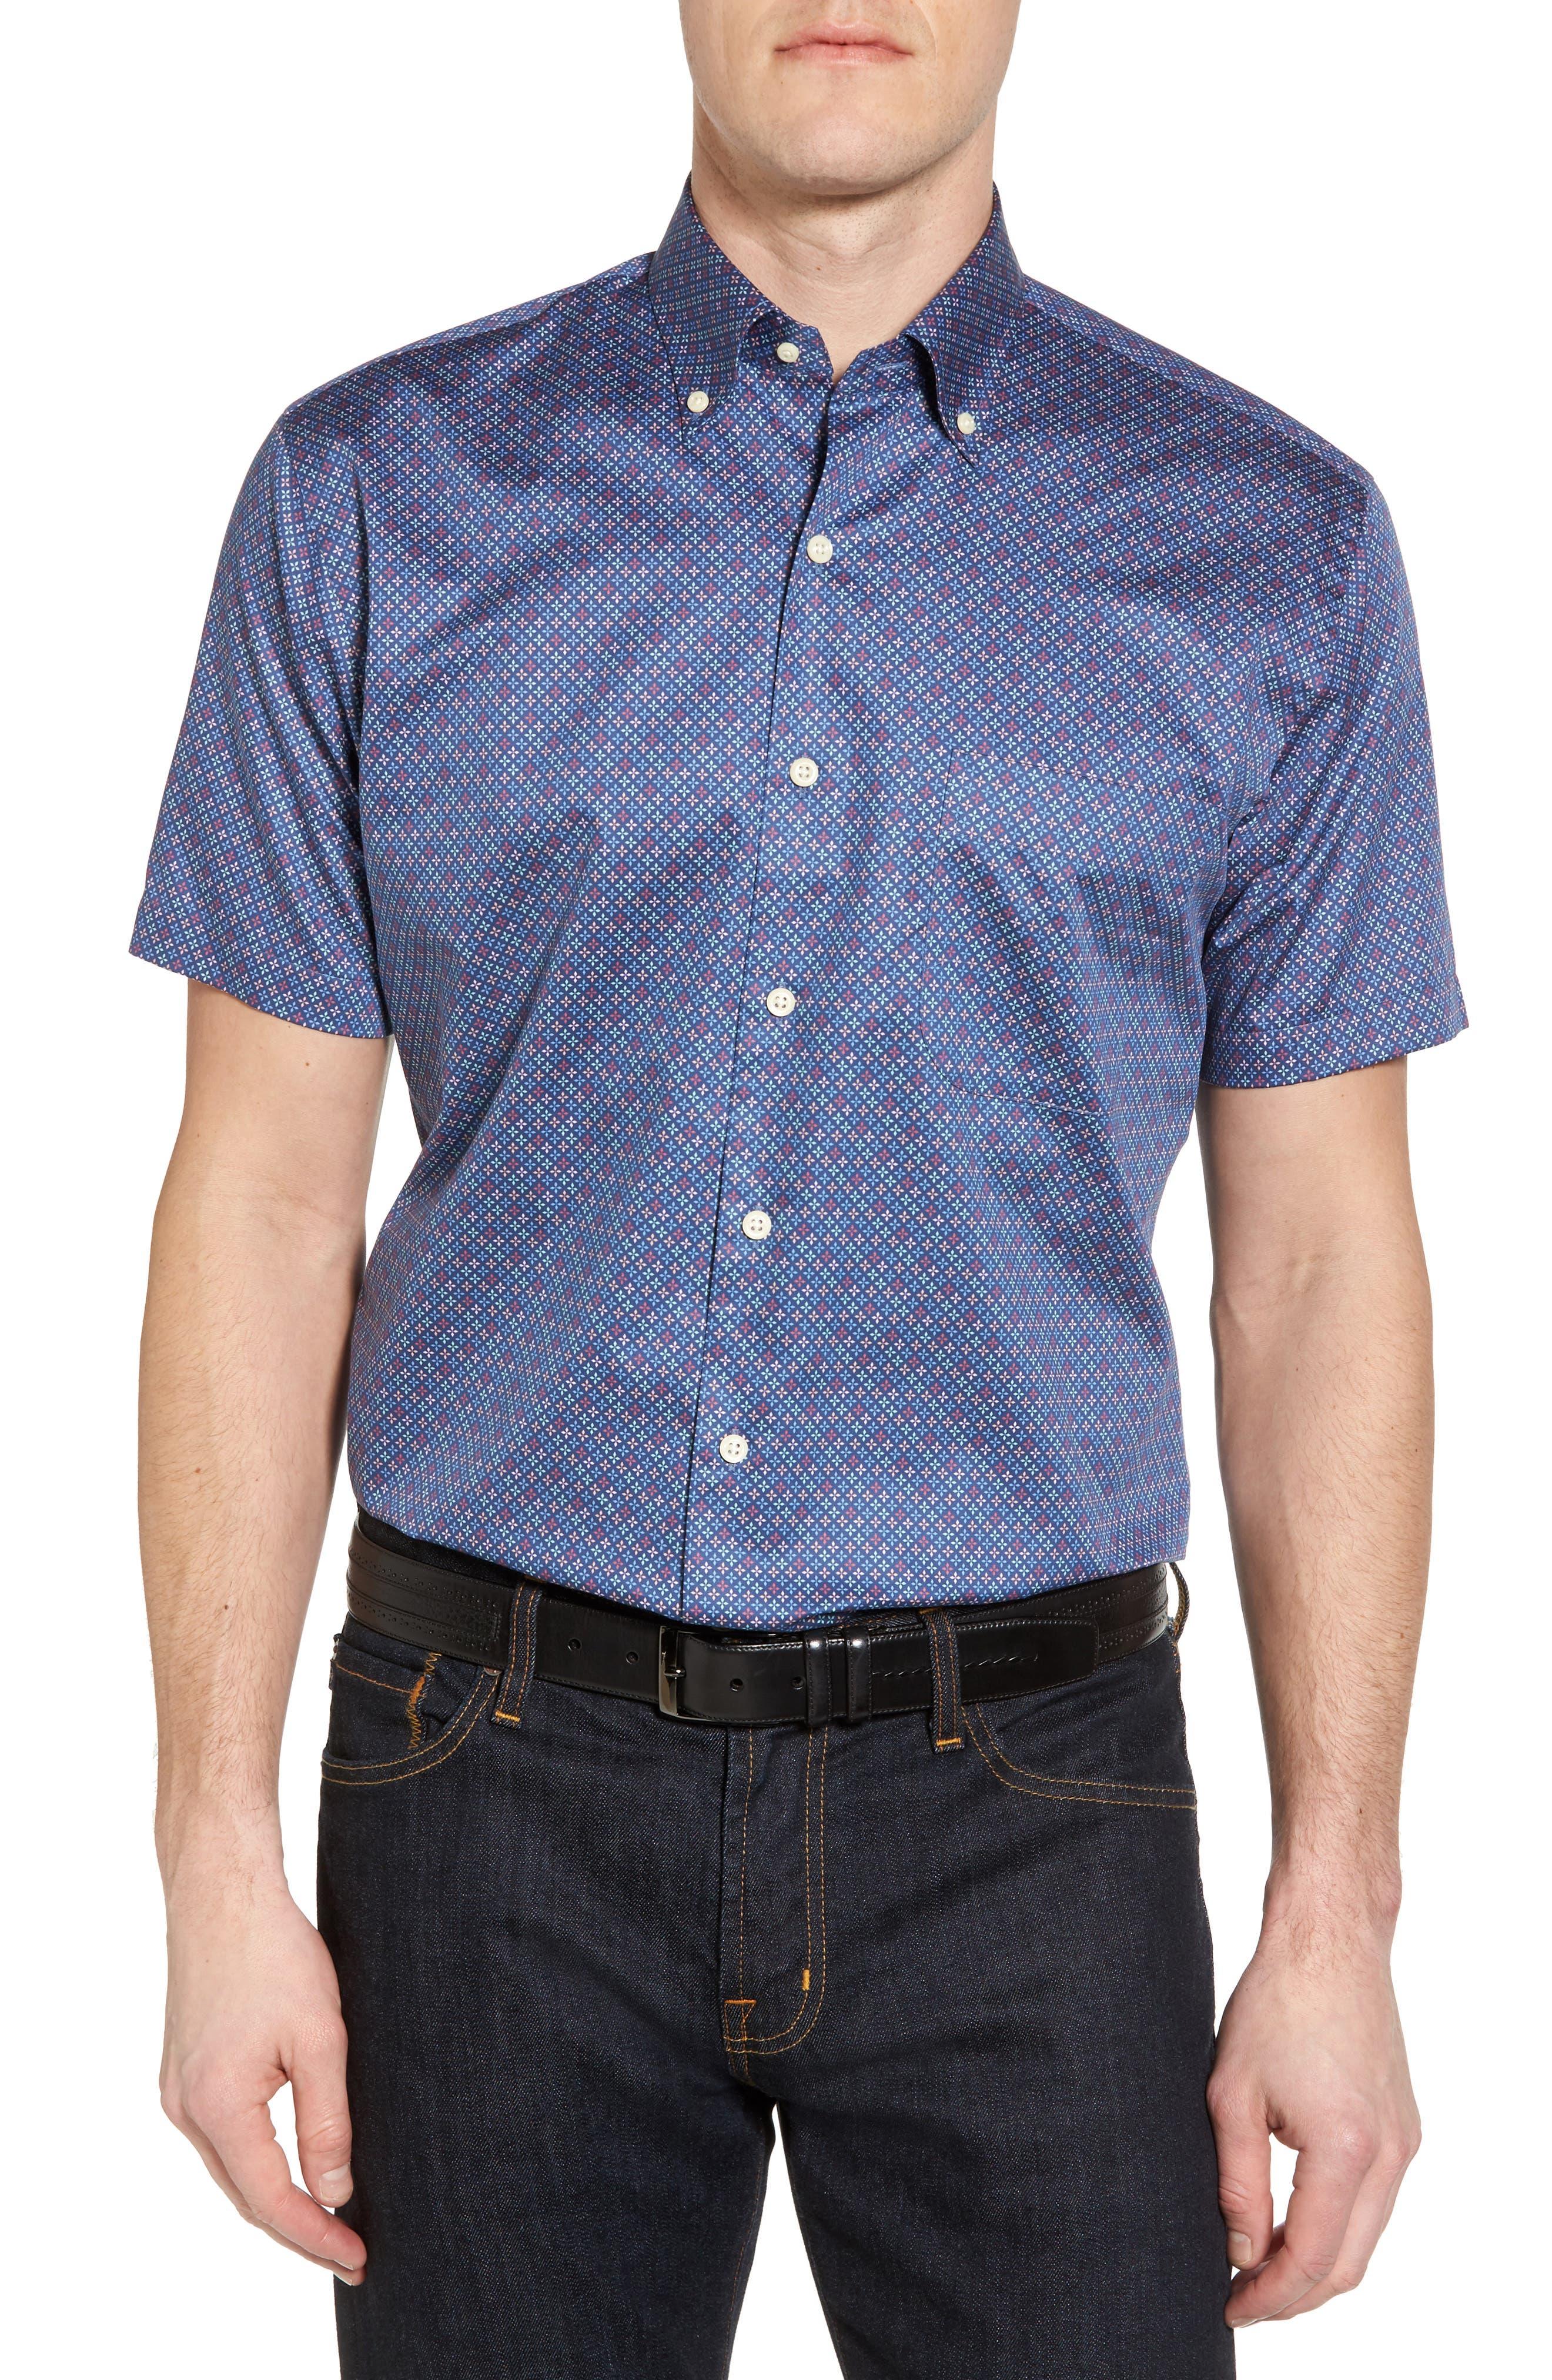 All Aces Regular Fit Sport Shirt,                         Main,                         color, YANKEE BLUE